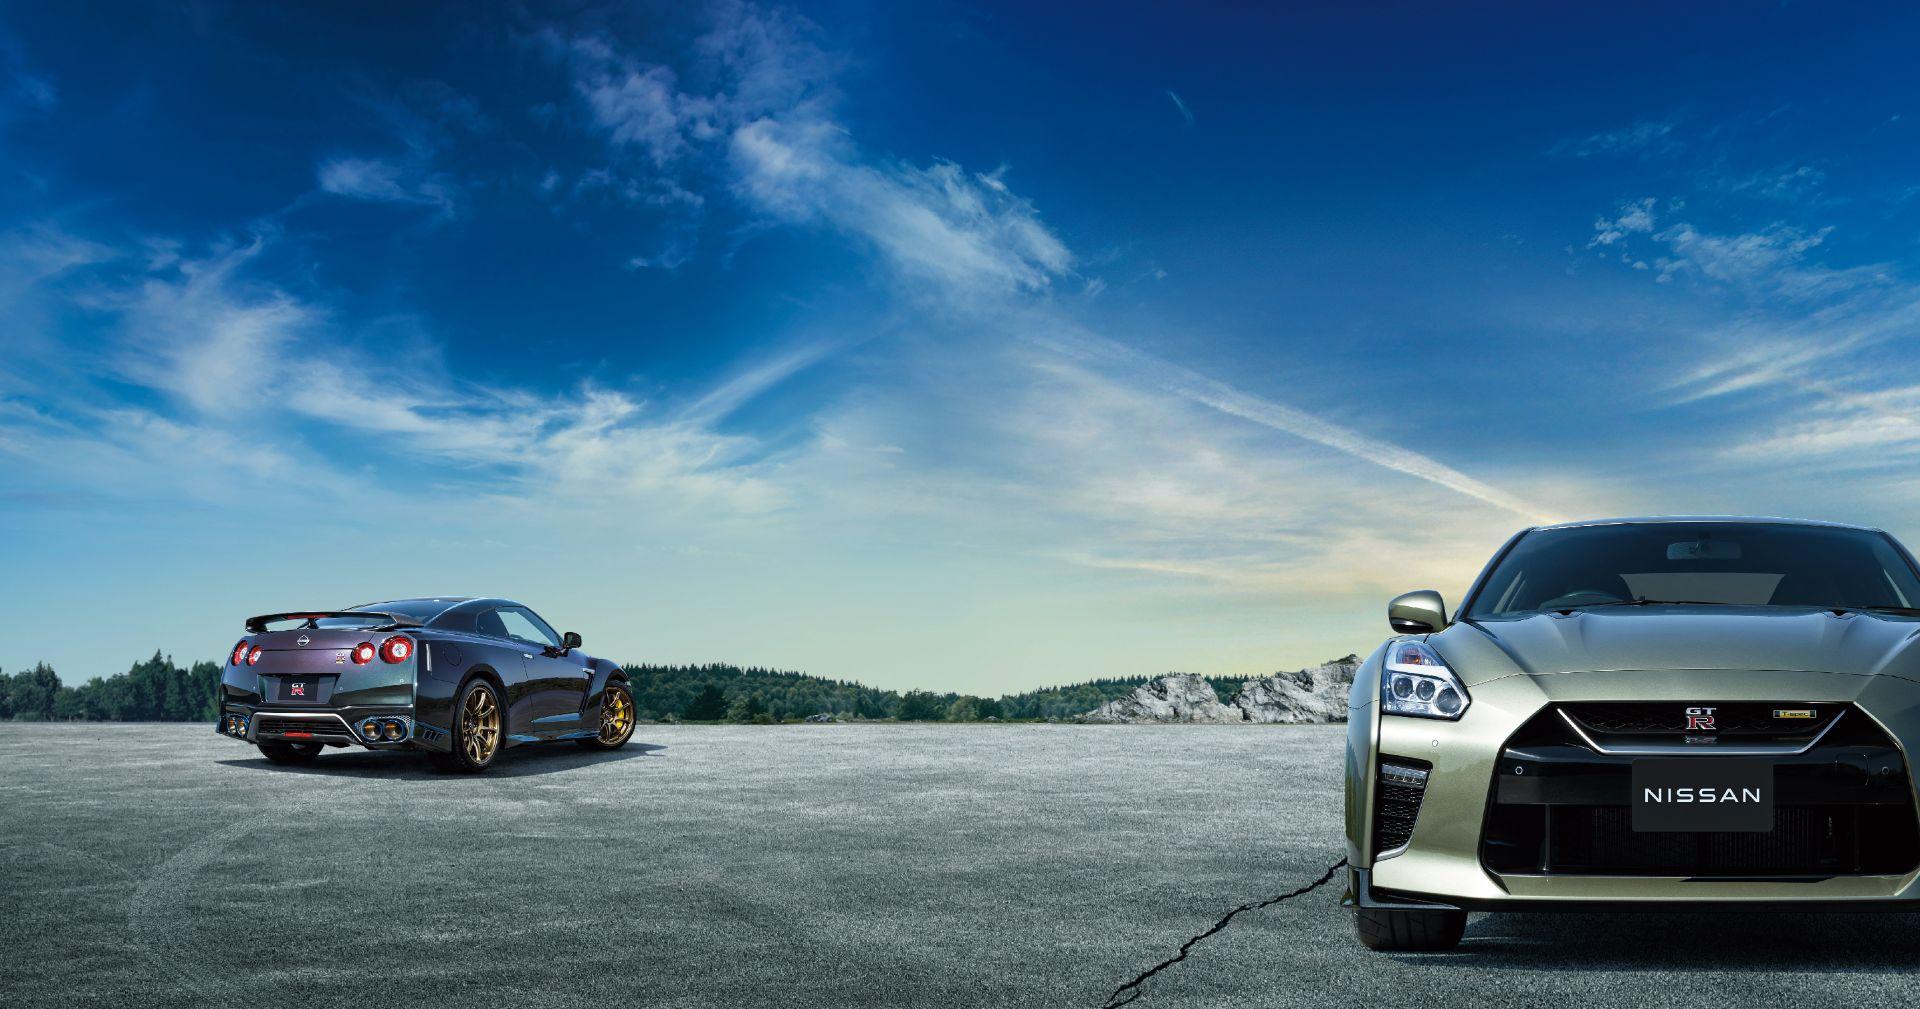 Nissan-GT-R-2021-4